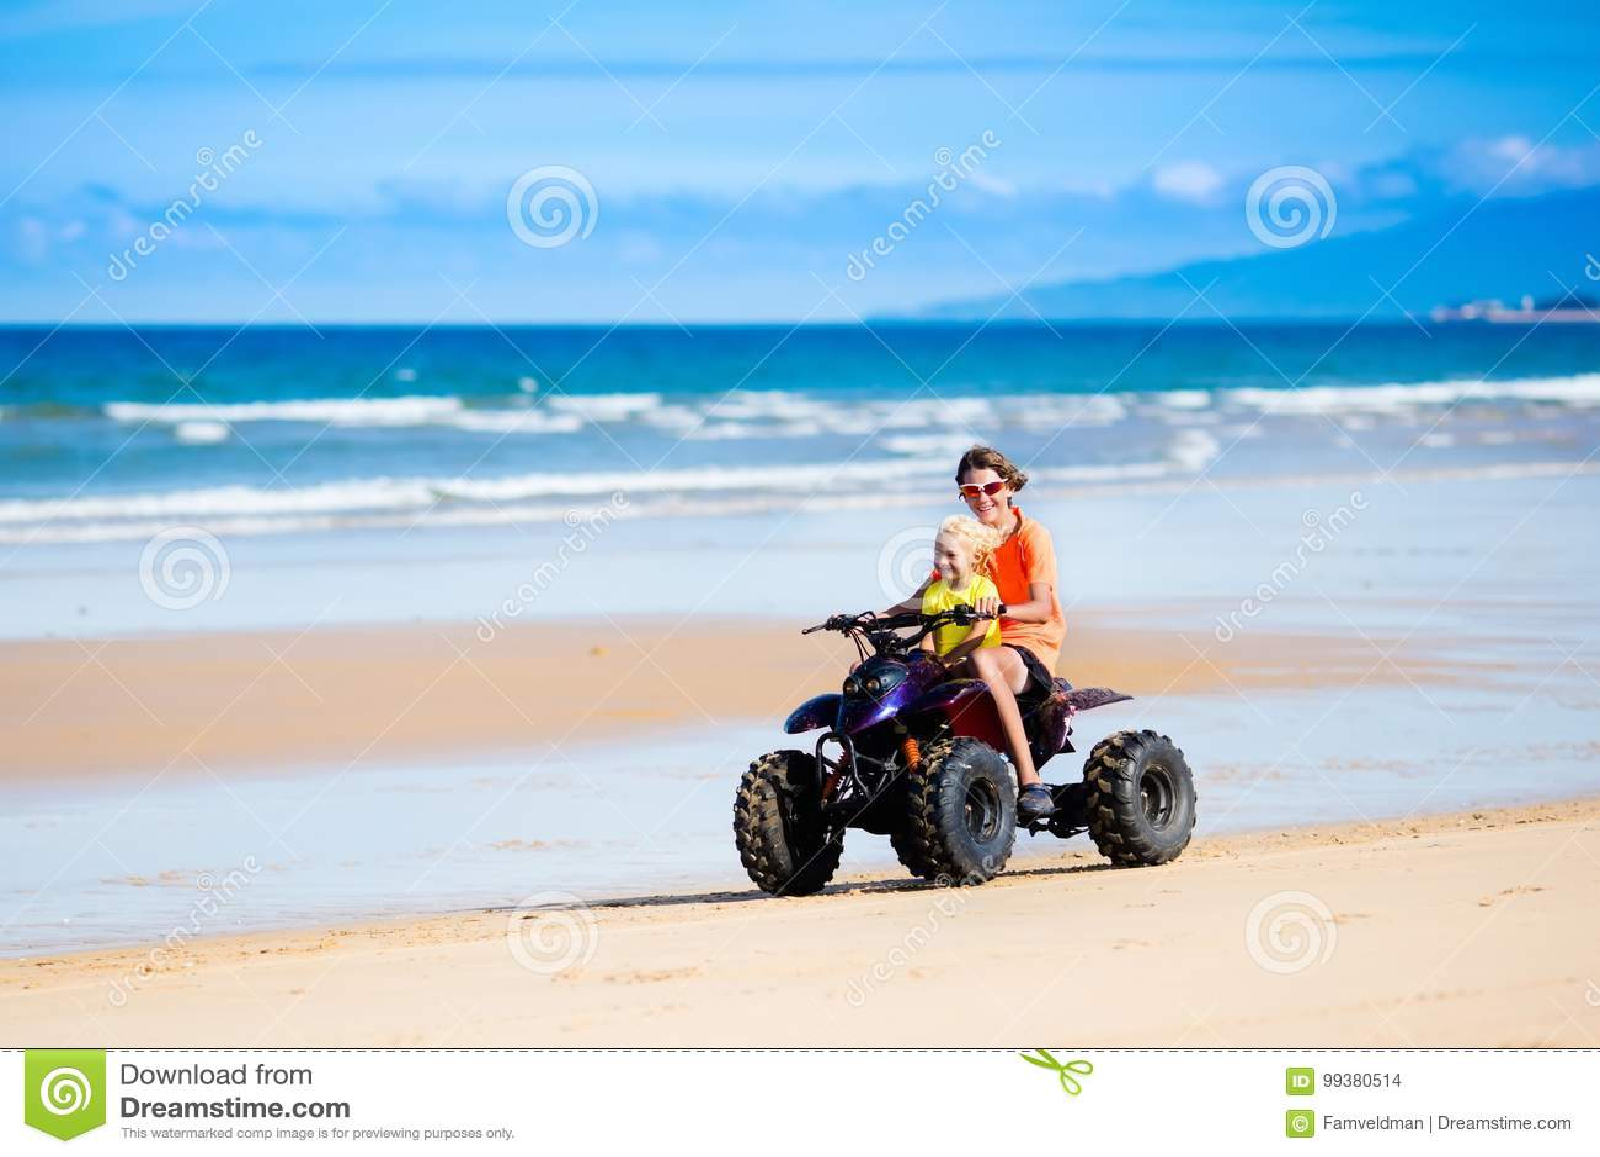 Kids On Quad Bike  Off Road All Terrain Vehicle  Stock Photo